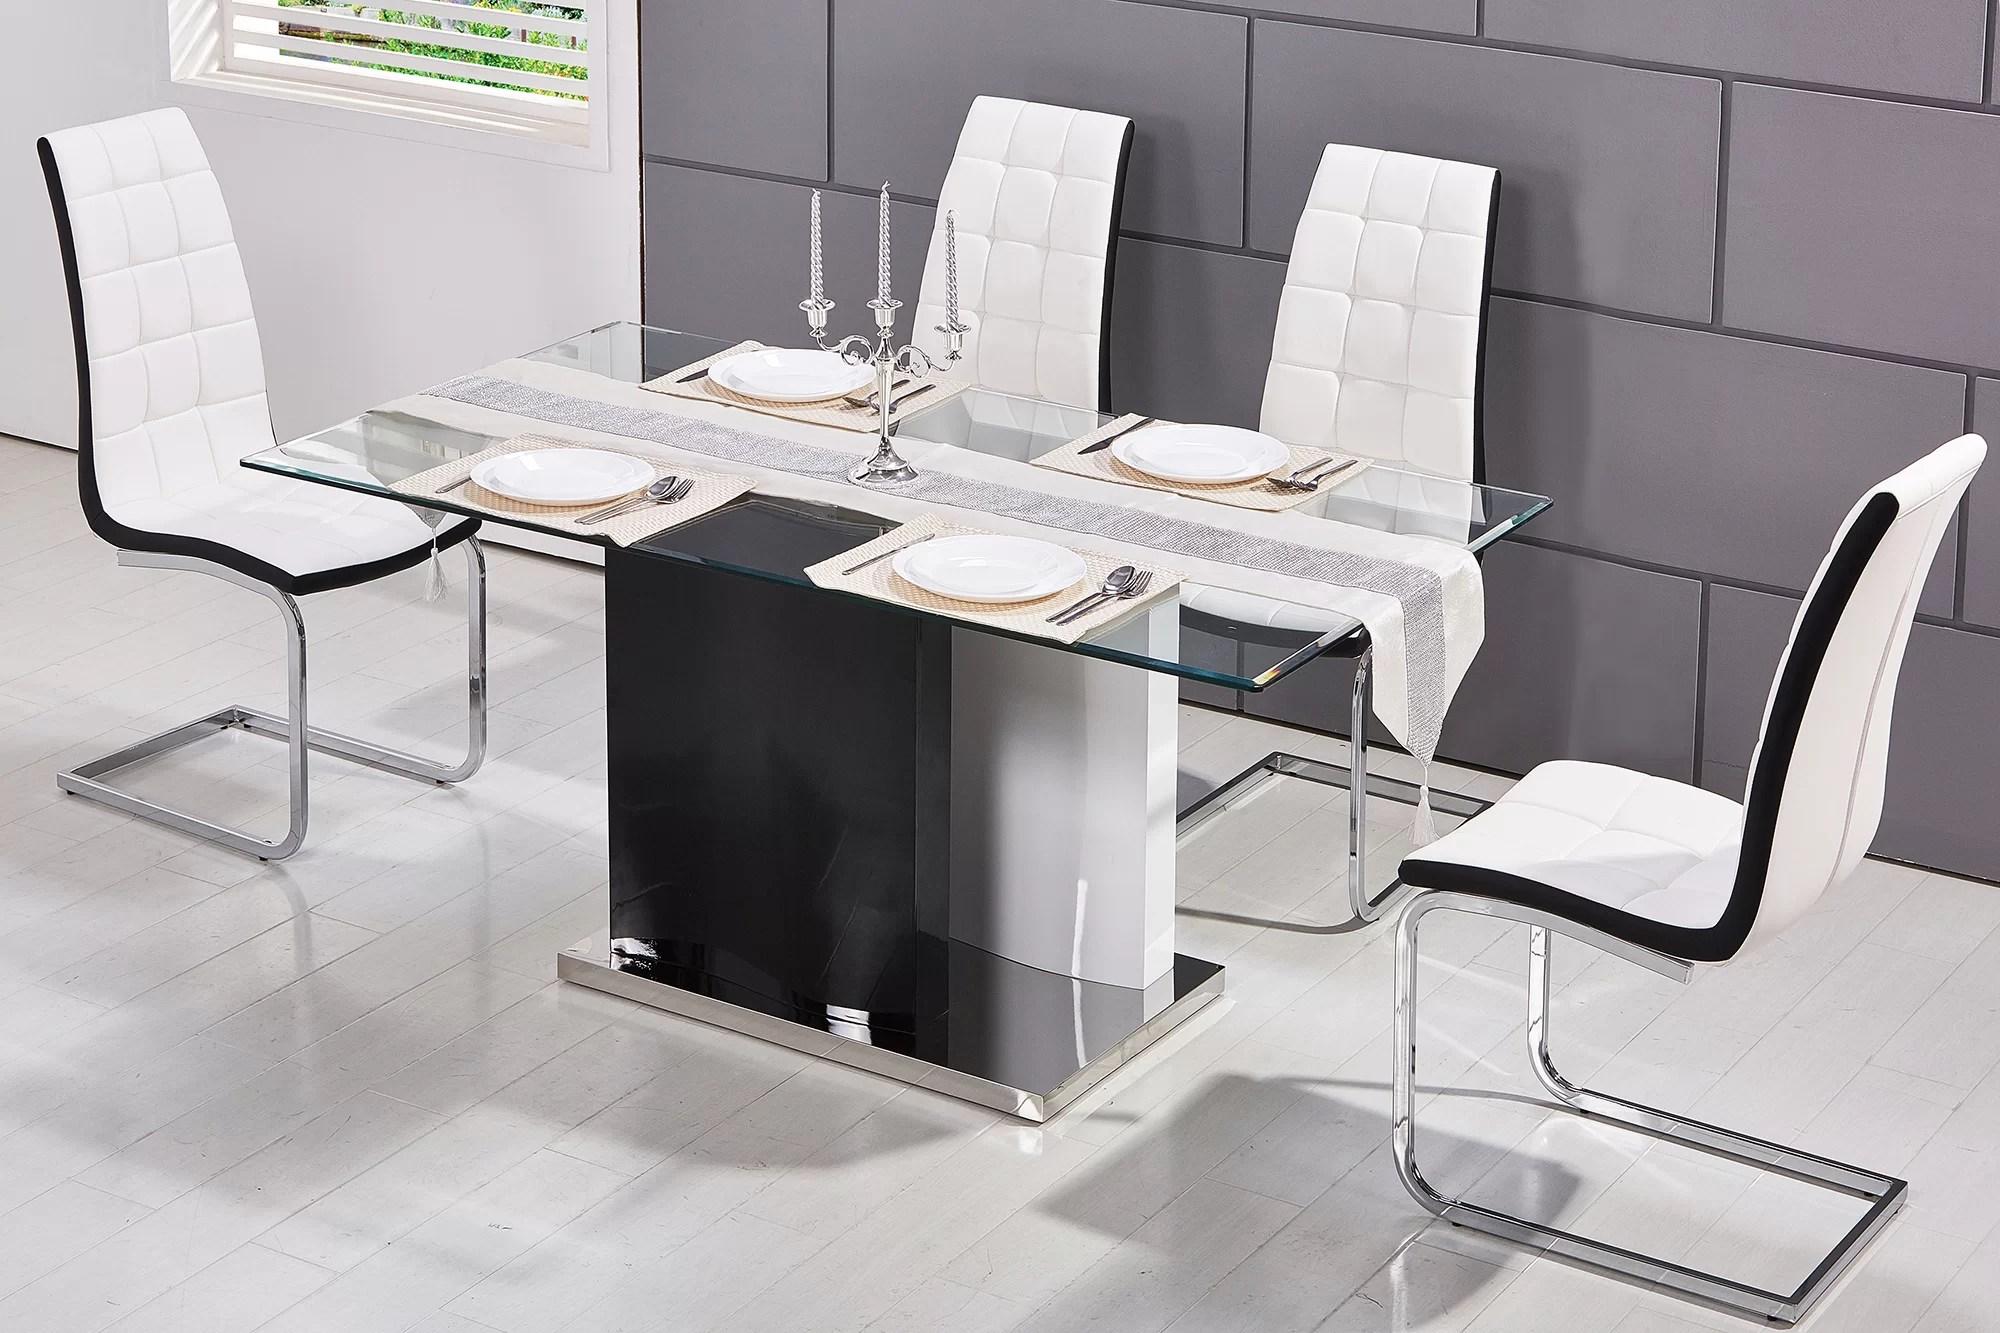 Orren Ellis Kingsdown Modern Glass Dining Table Reviews Wayfair